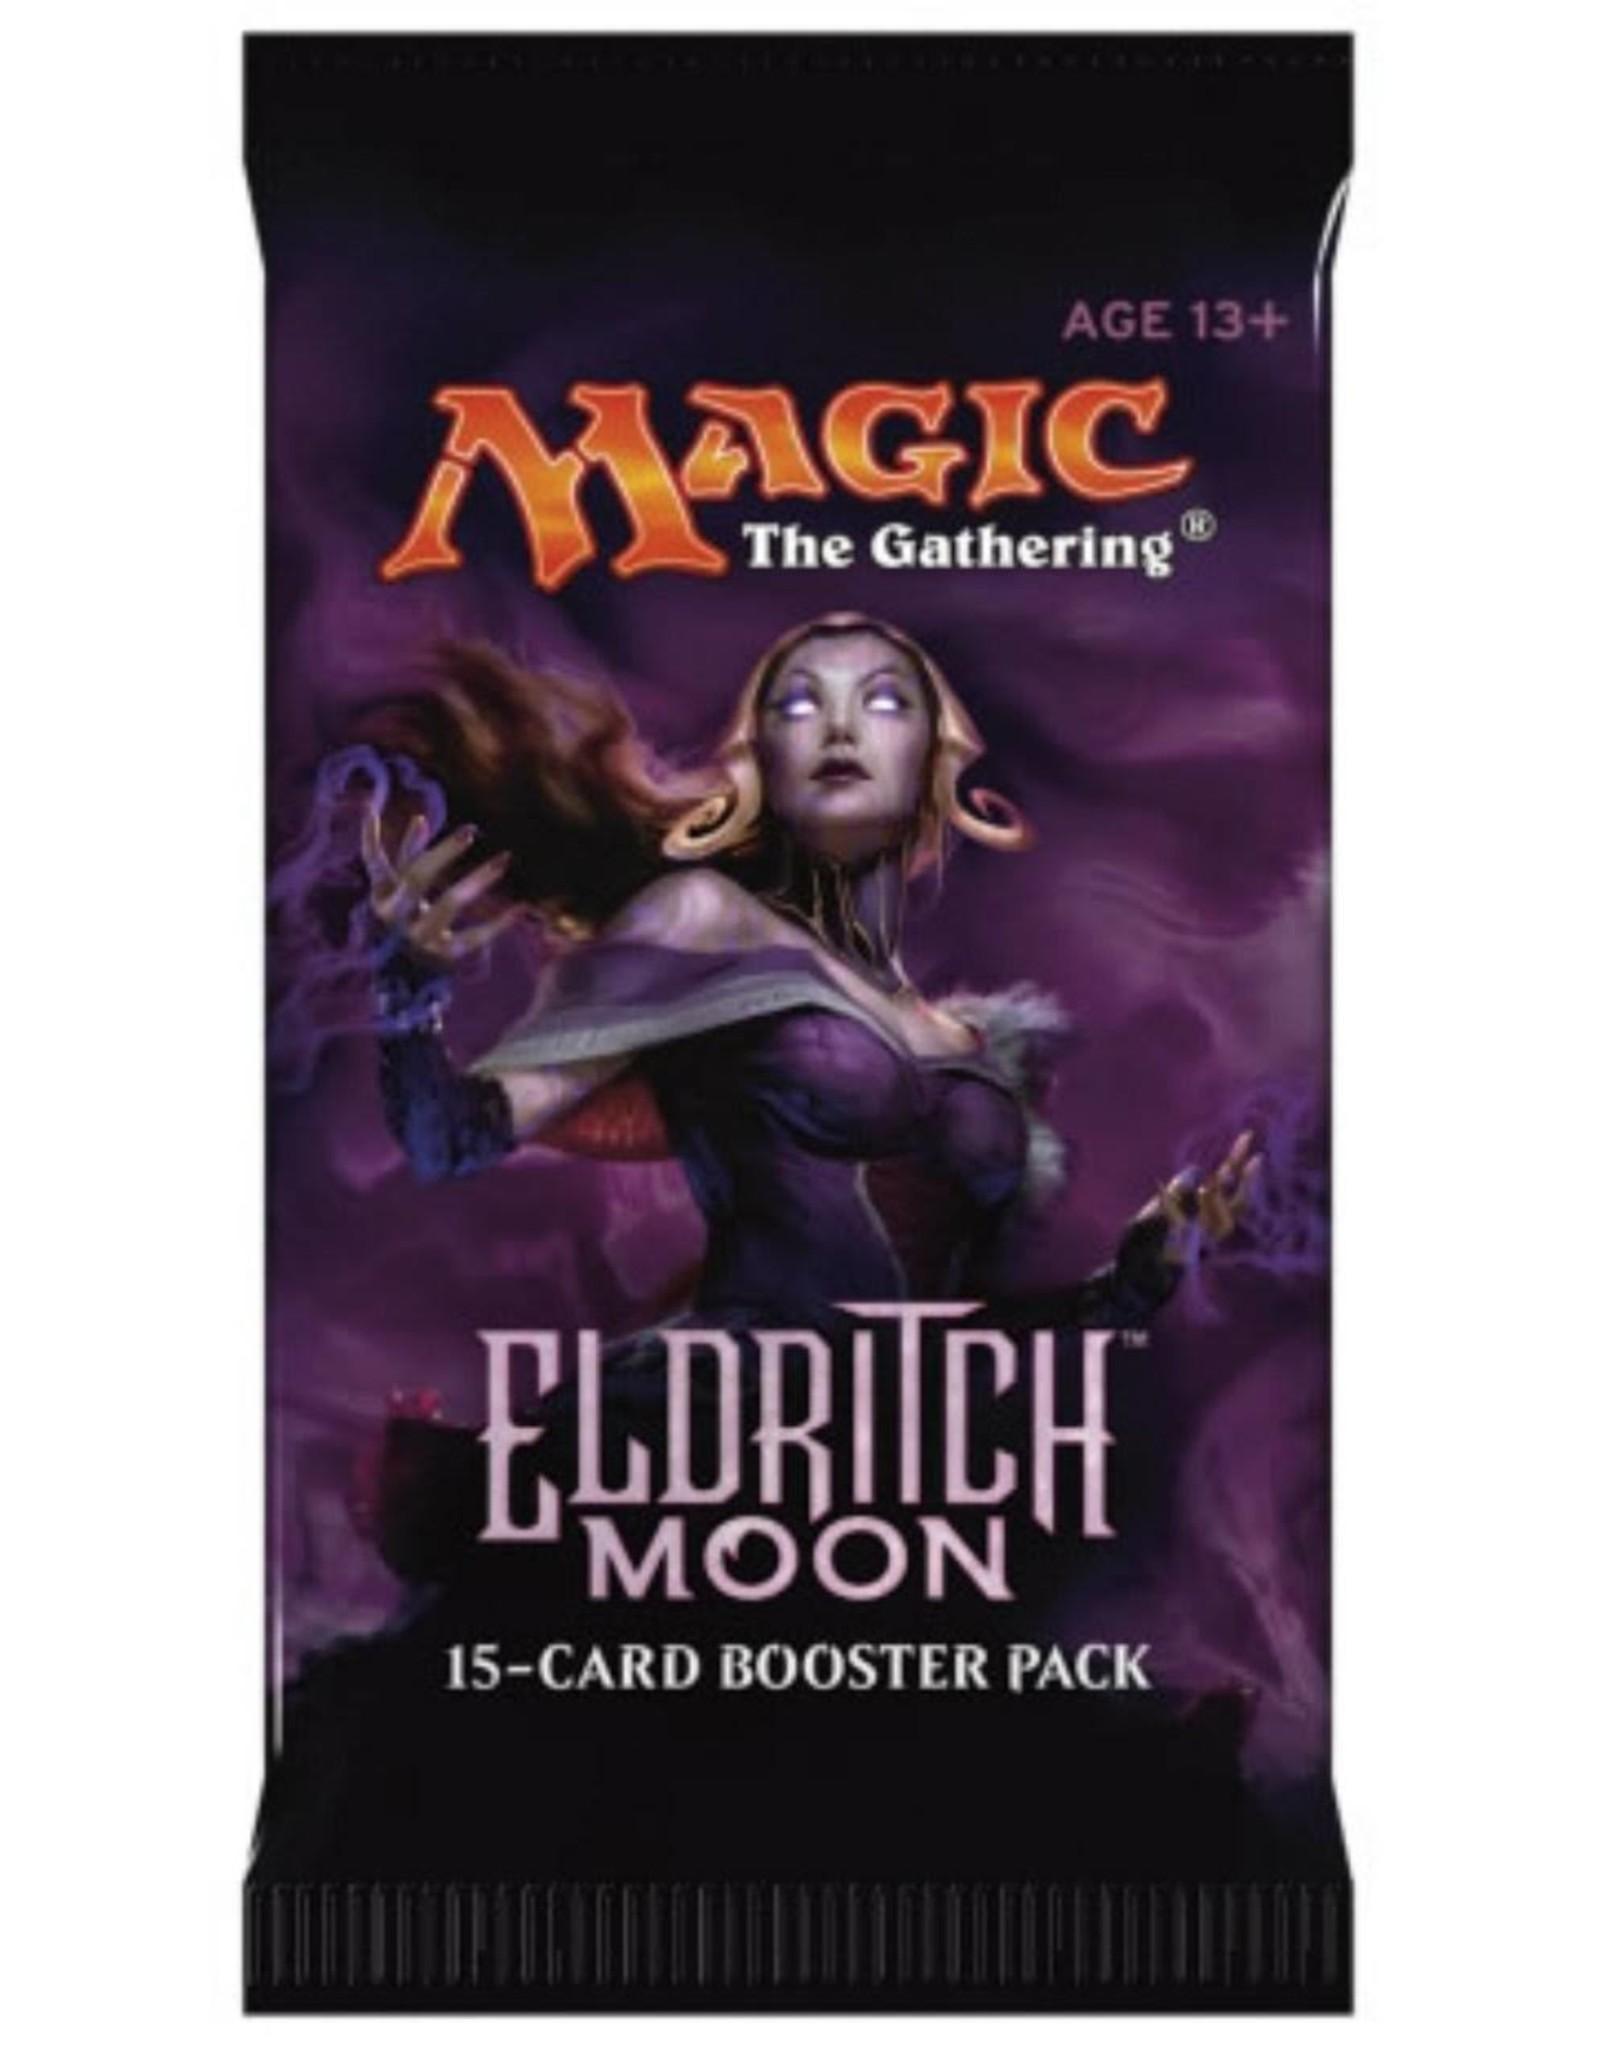 Magic Eldritch Moon Booster Pack